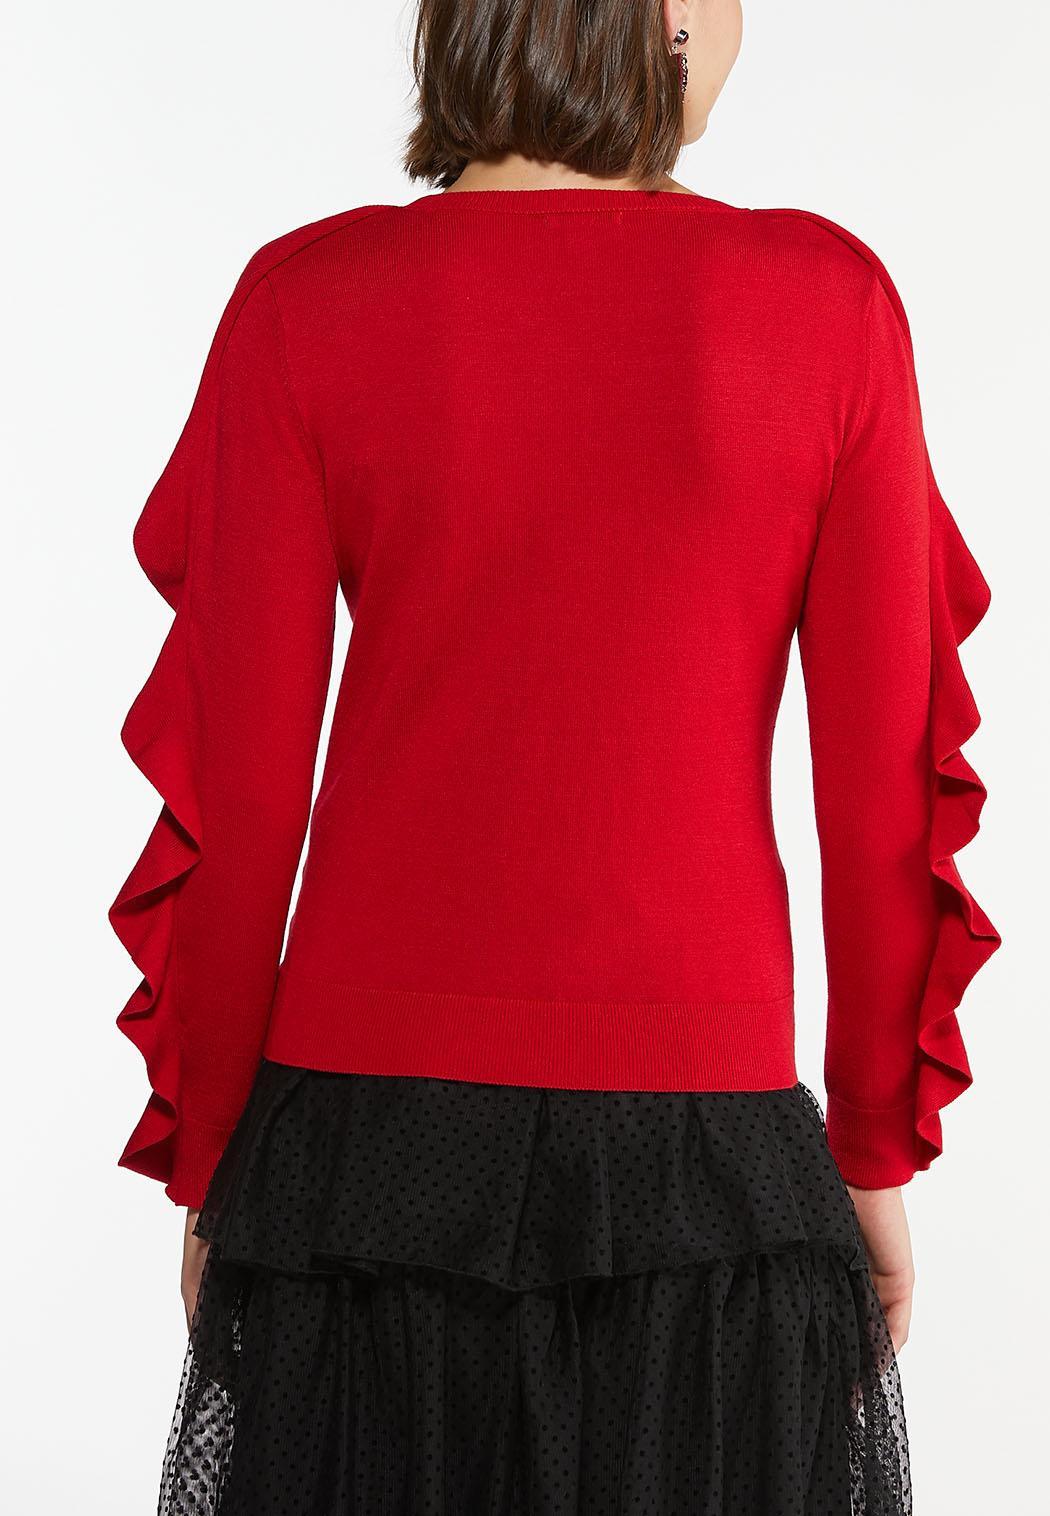 Ruffle Sleeve Sweater (Item #44405868)